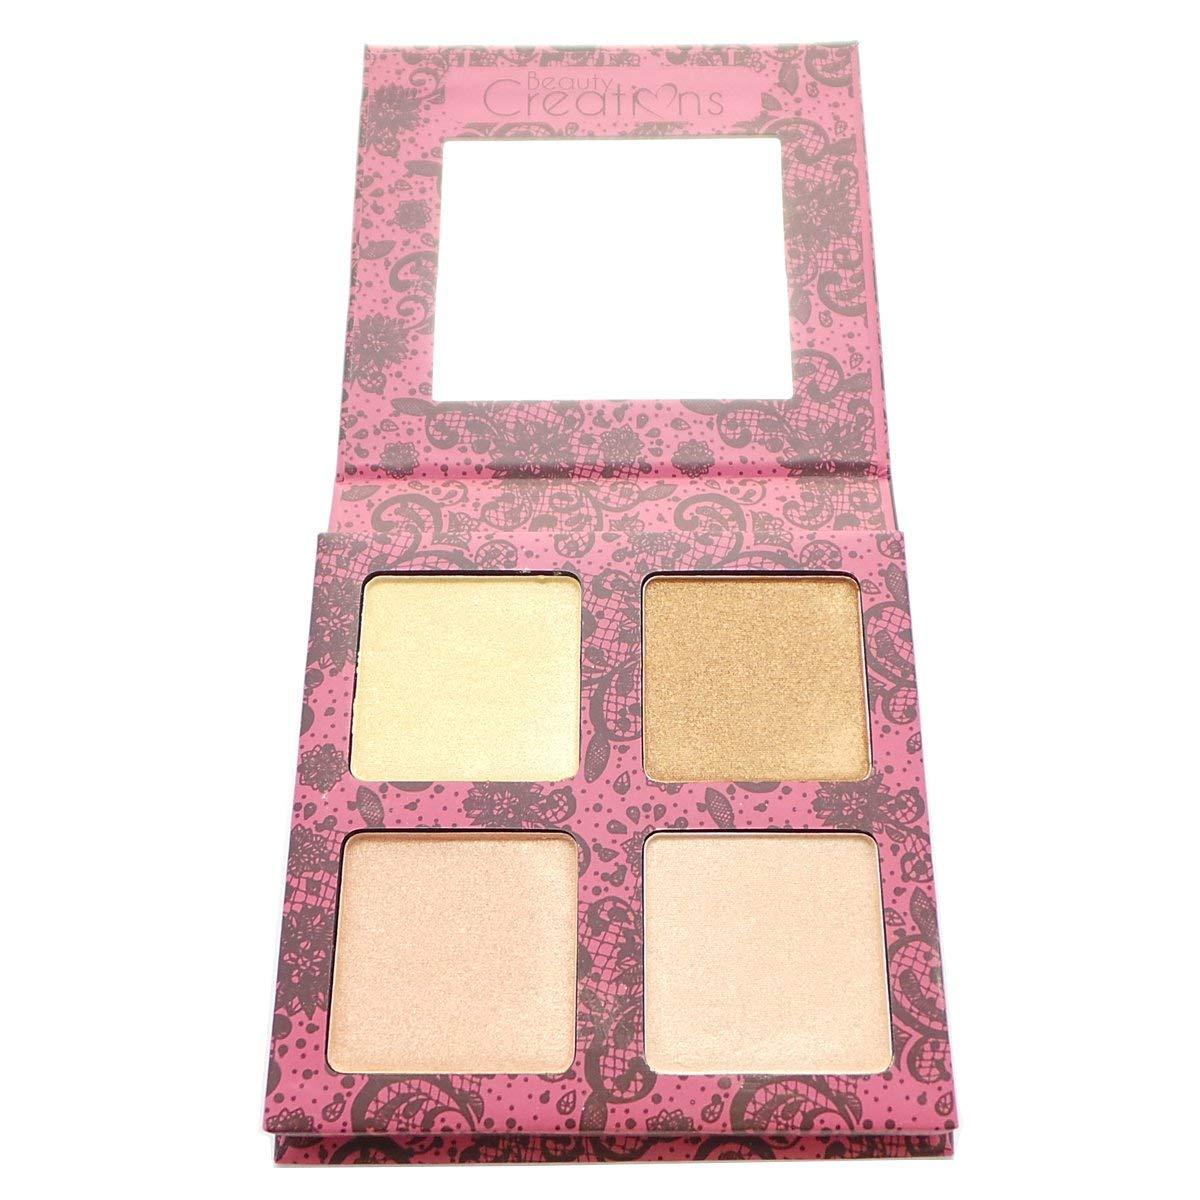 Beauty Creations Glow Highlight Palette 4 Powder (SCANDALOUS GLOW)